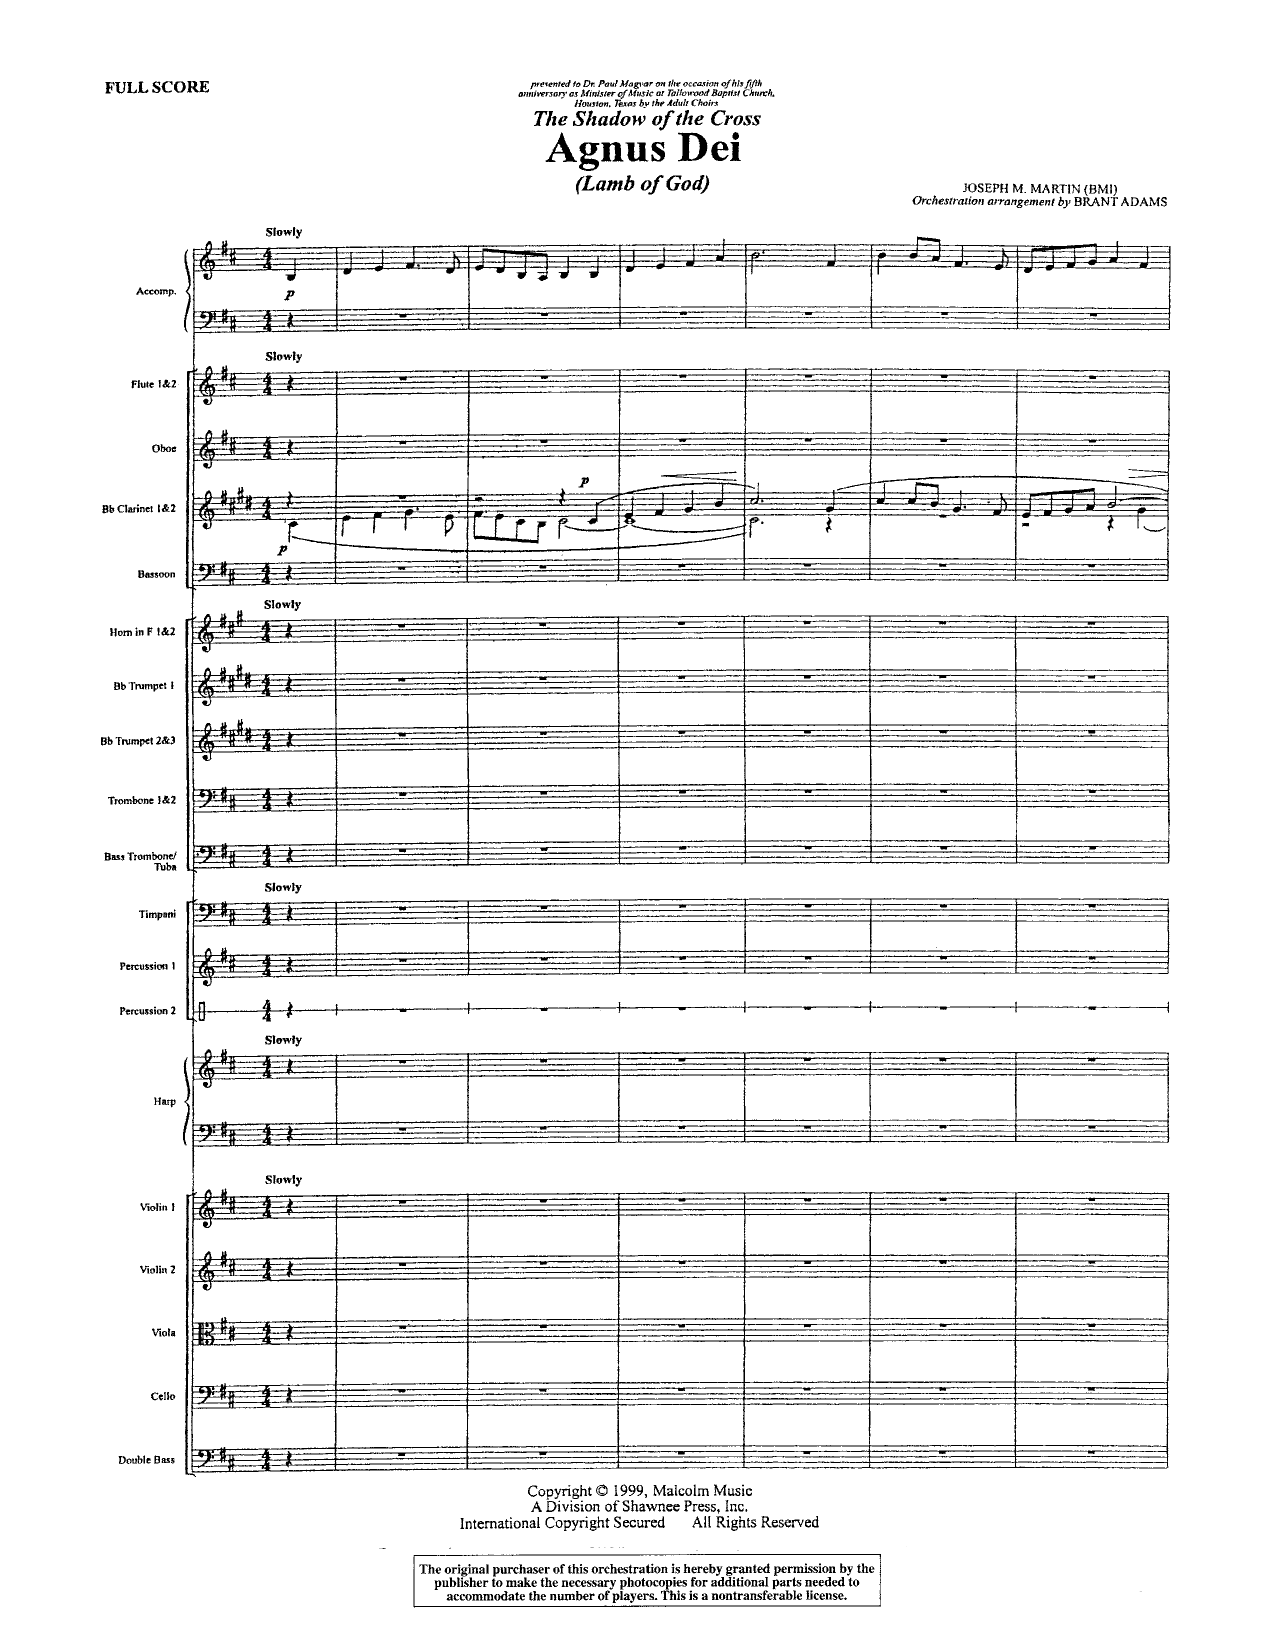 Joseph M. Martin Agnus Dei - Full Score sheet music notes and chords. Download Printable PDF.